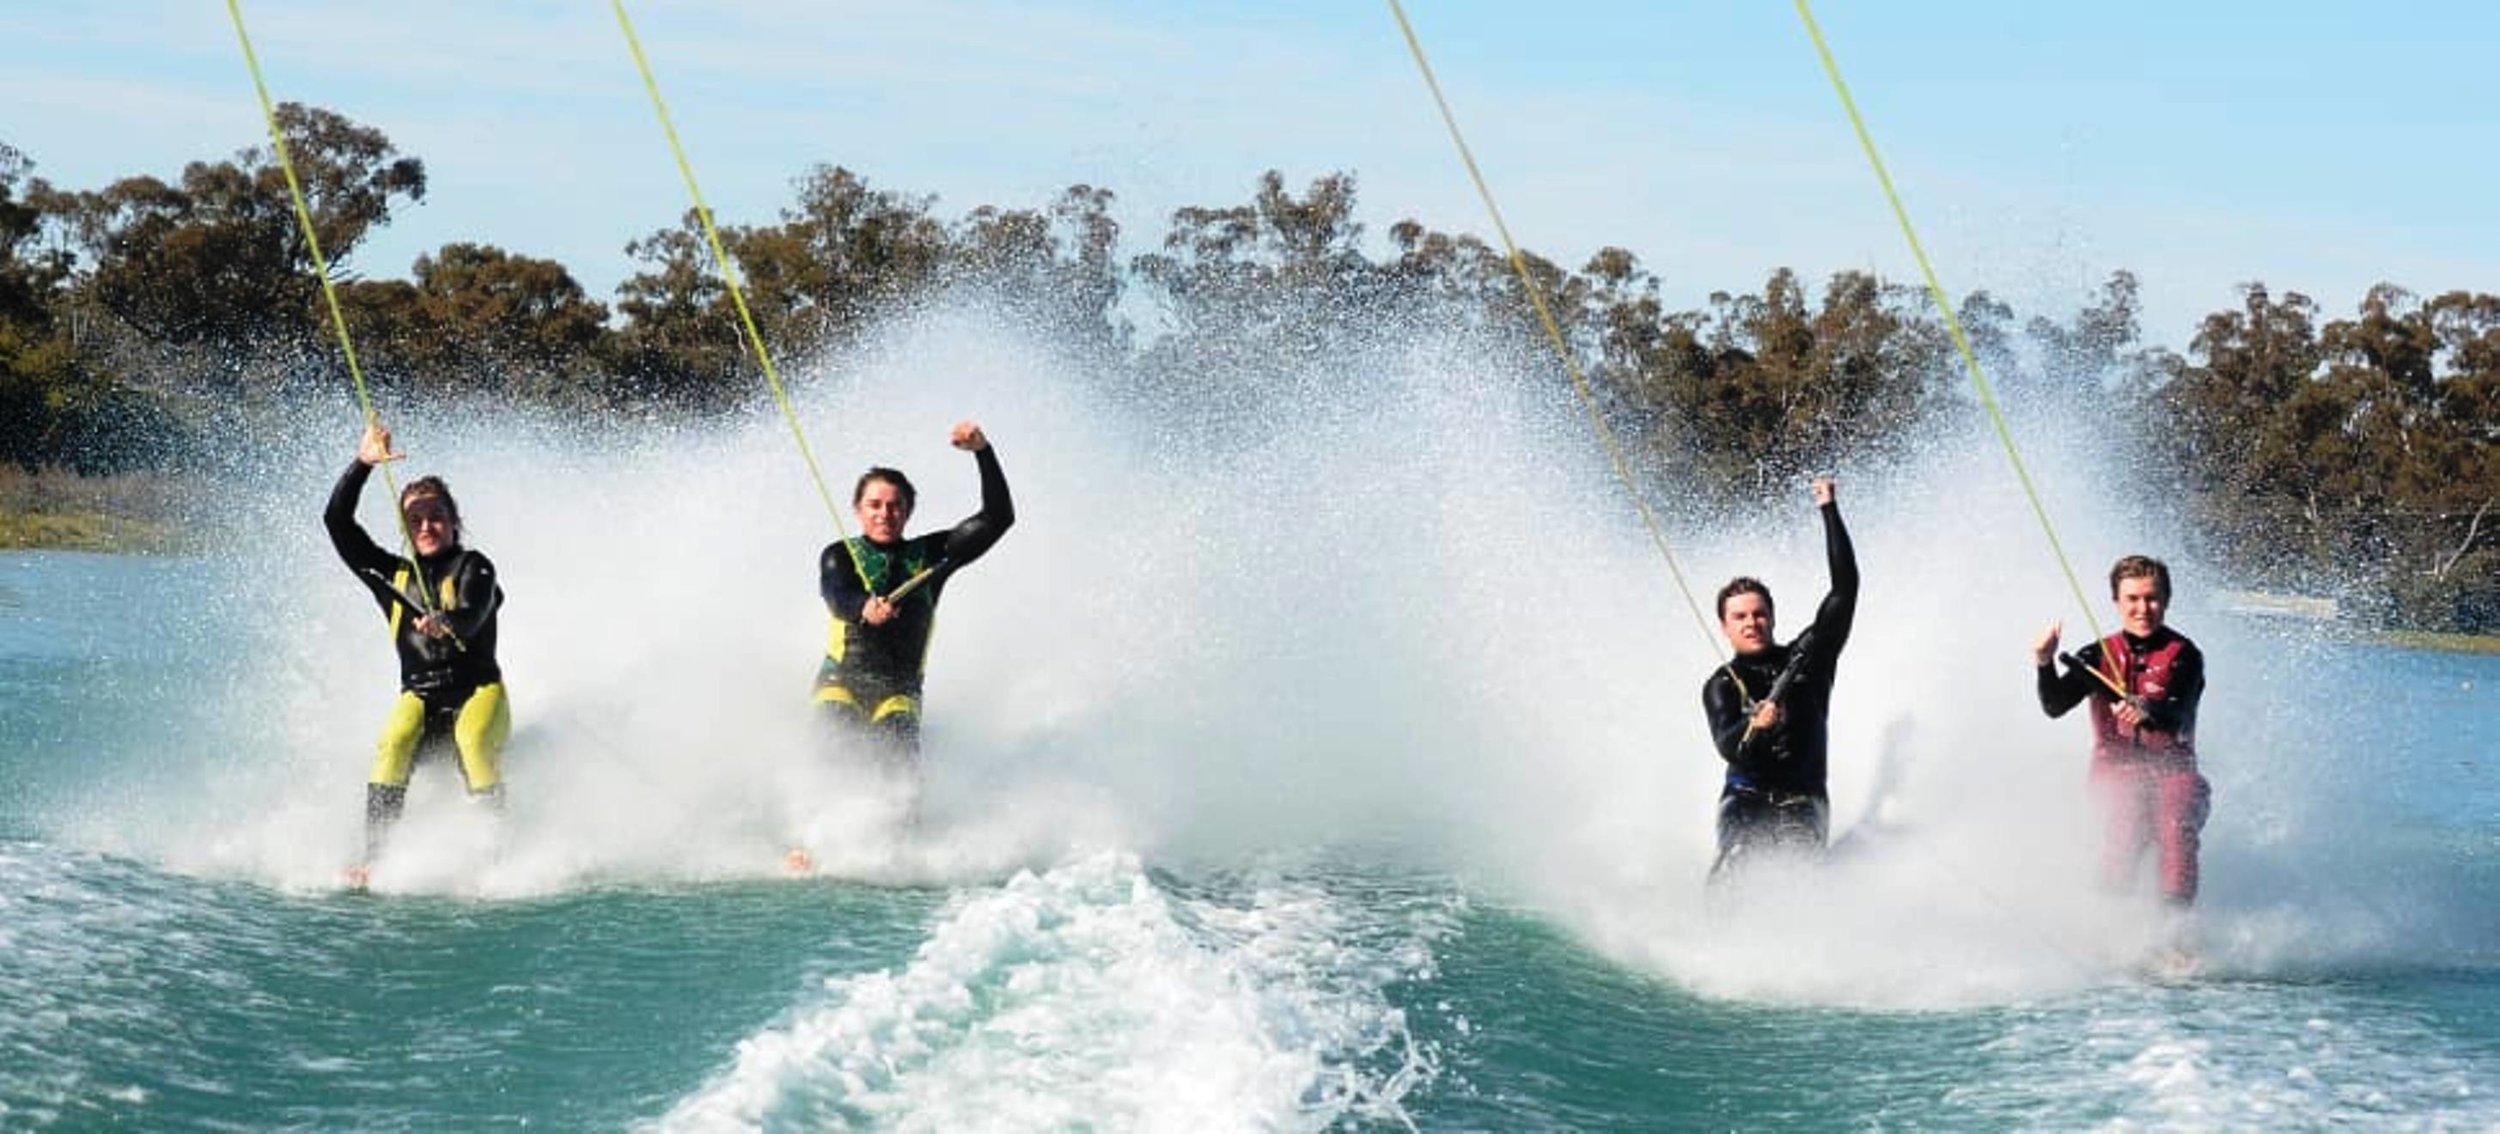 water-skiing-mulwala-resort.jpg